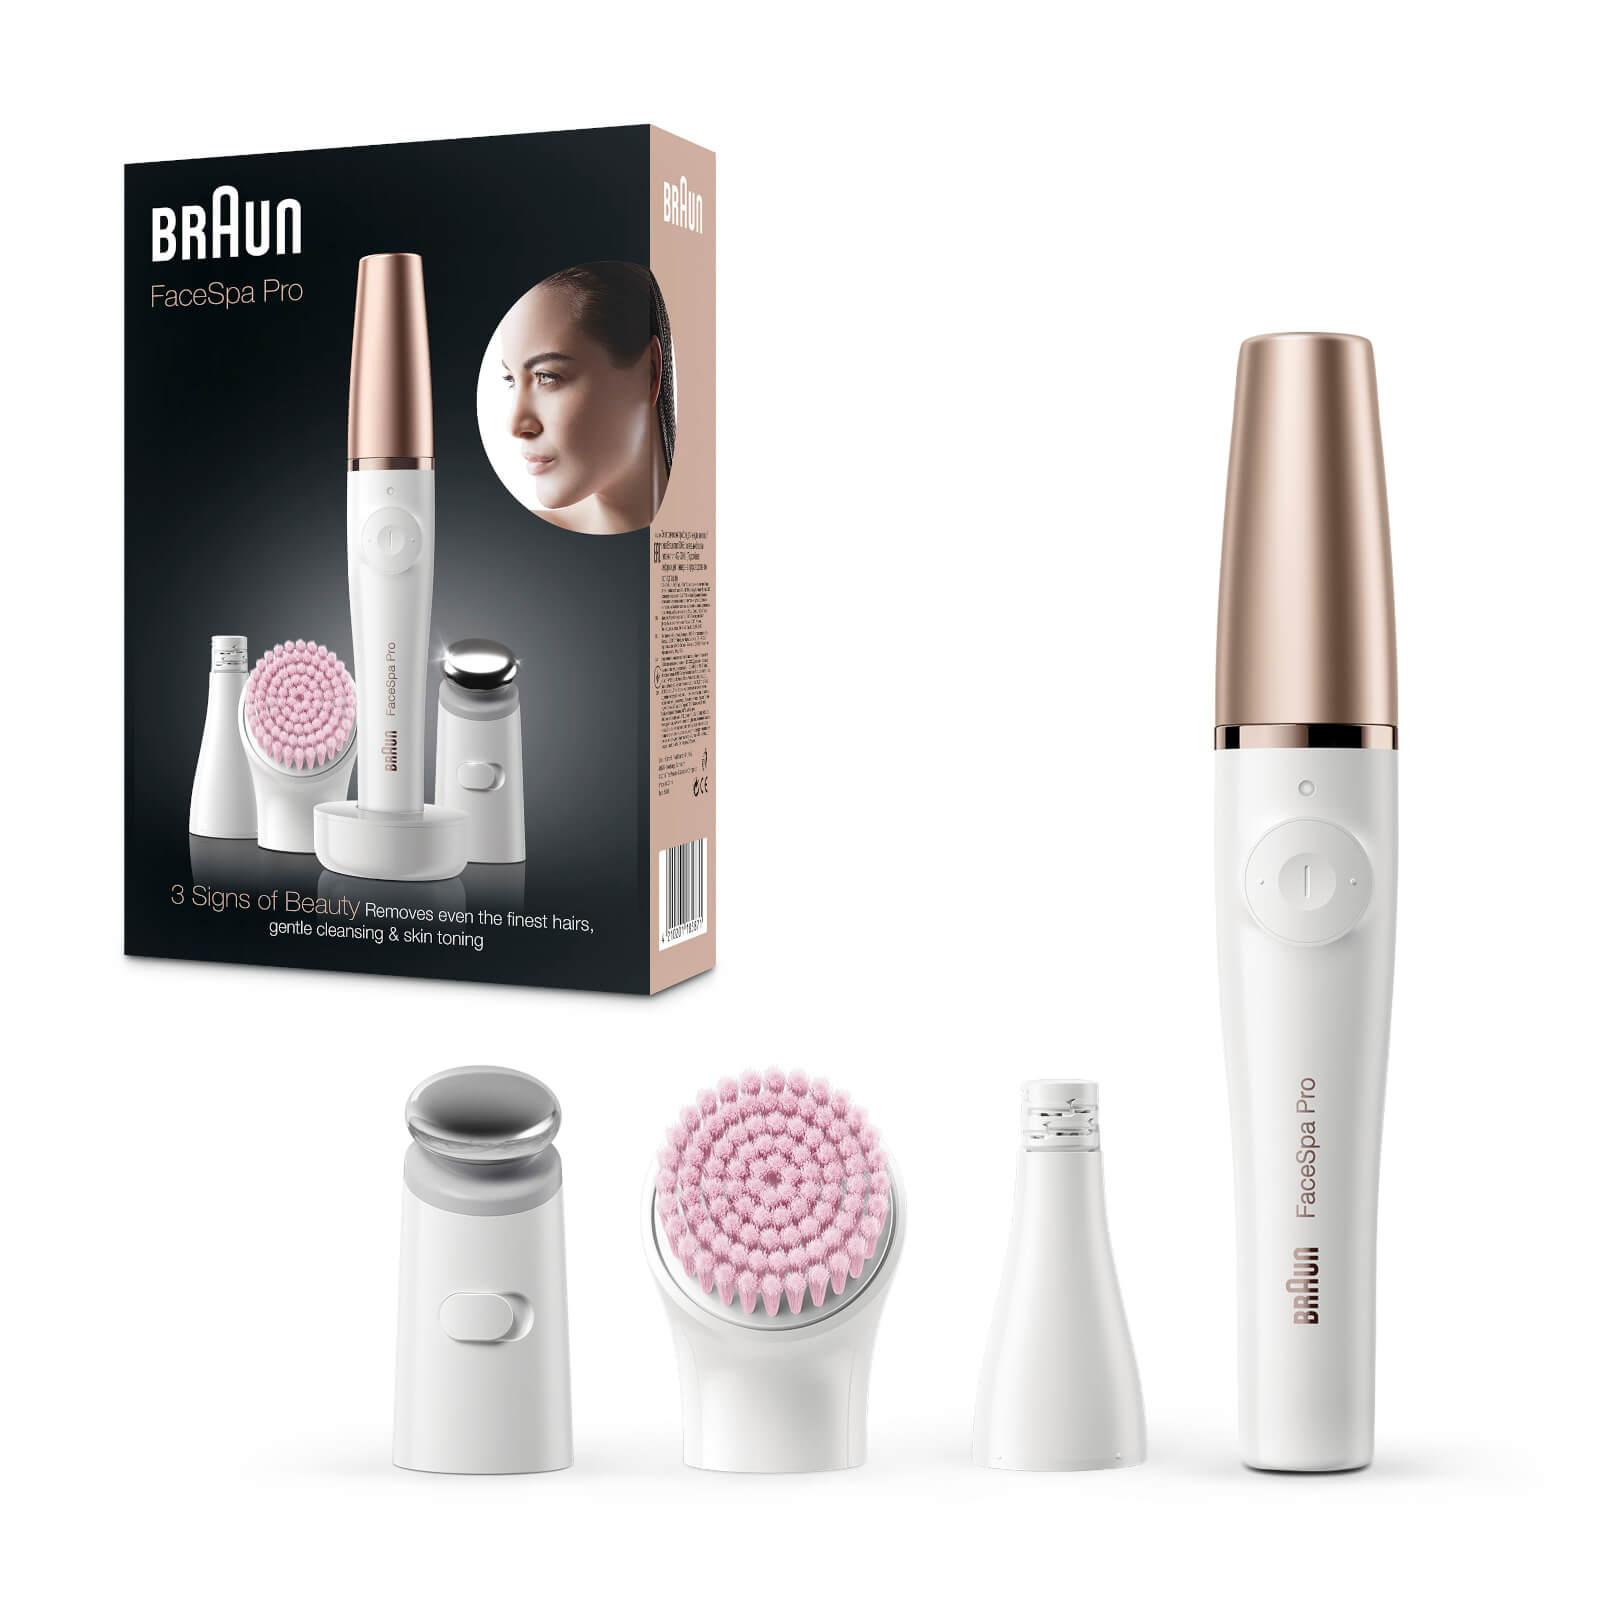 FaceSpa Pro Facial Epilator with 5 Extras incl. Sensitive Cleansing Brush, Bronze